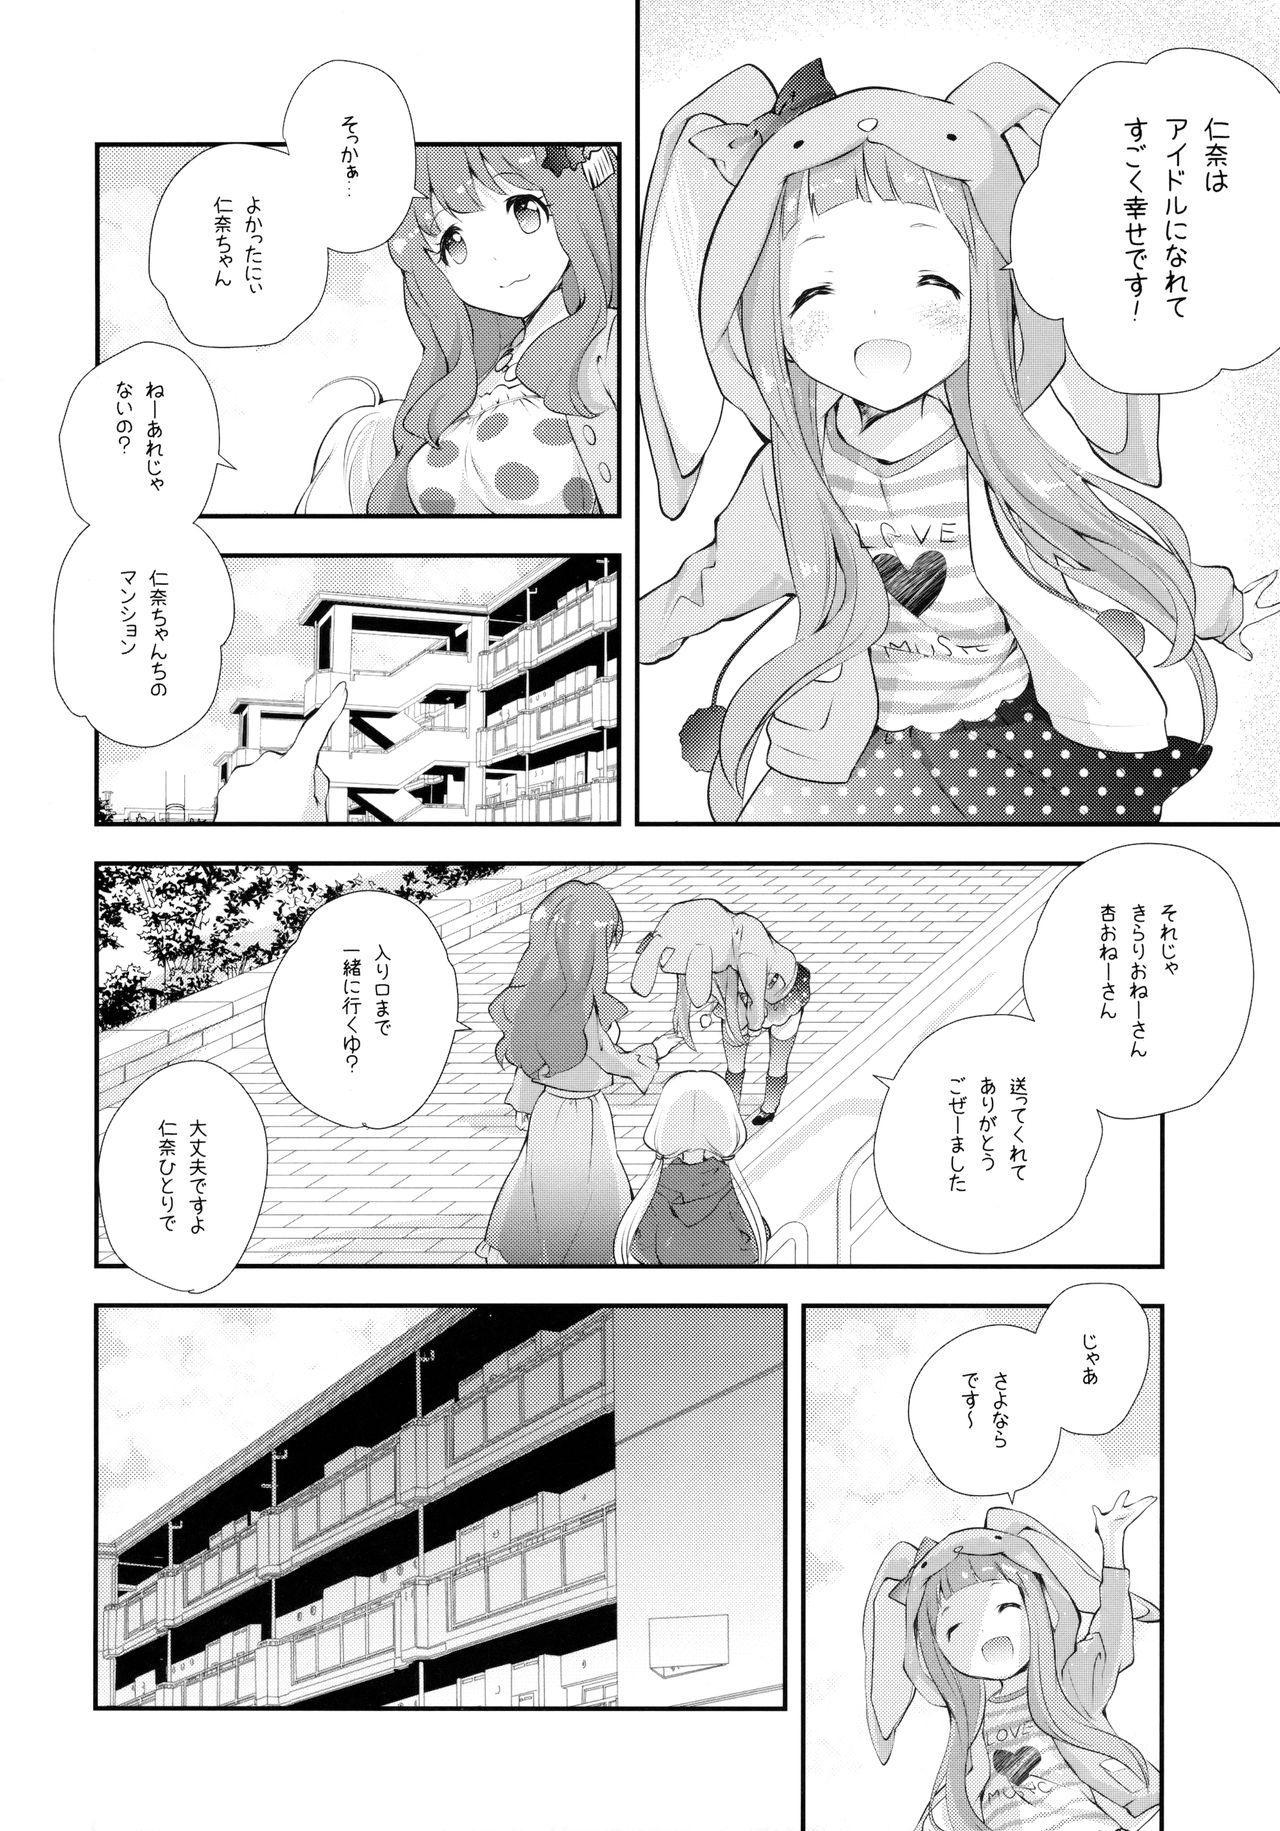 Kigurumi Living Doll 4